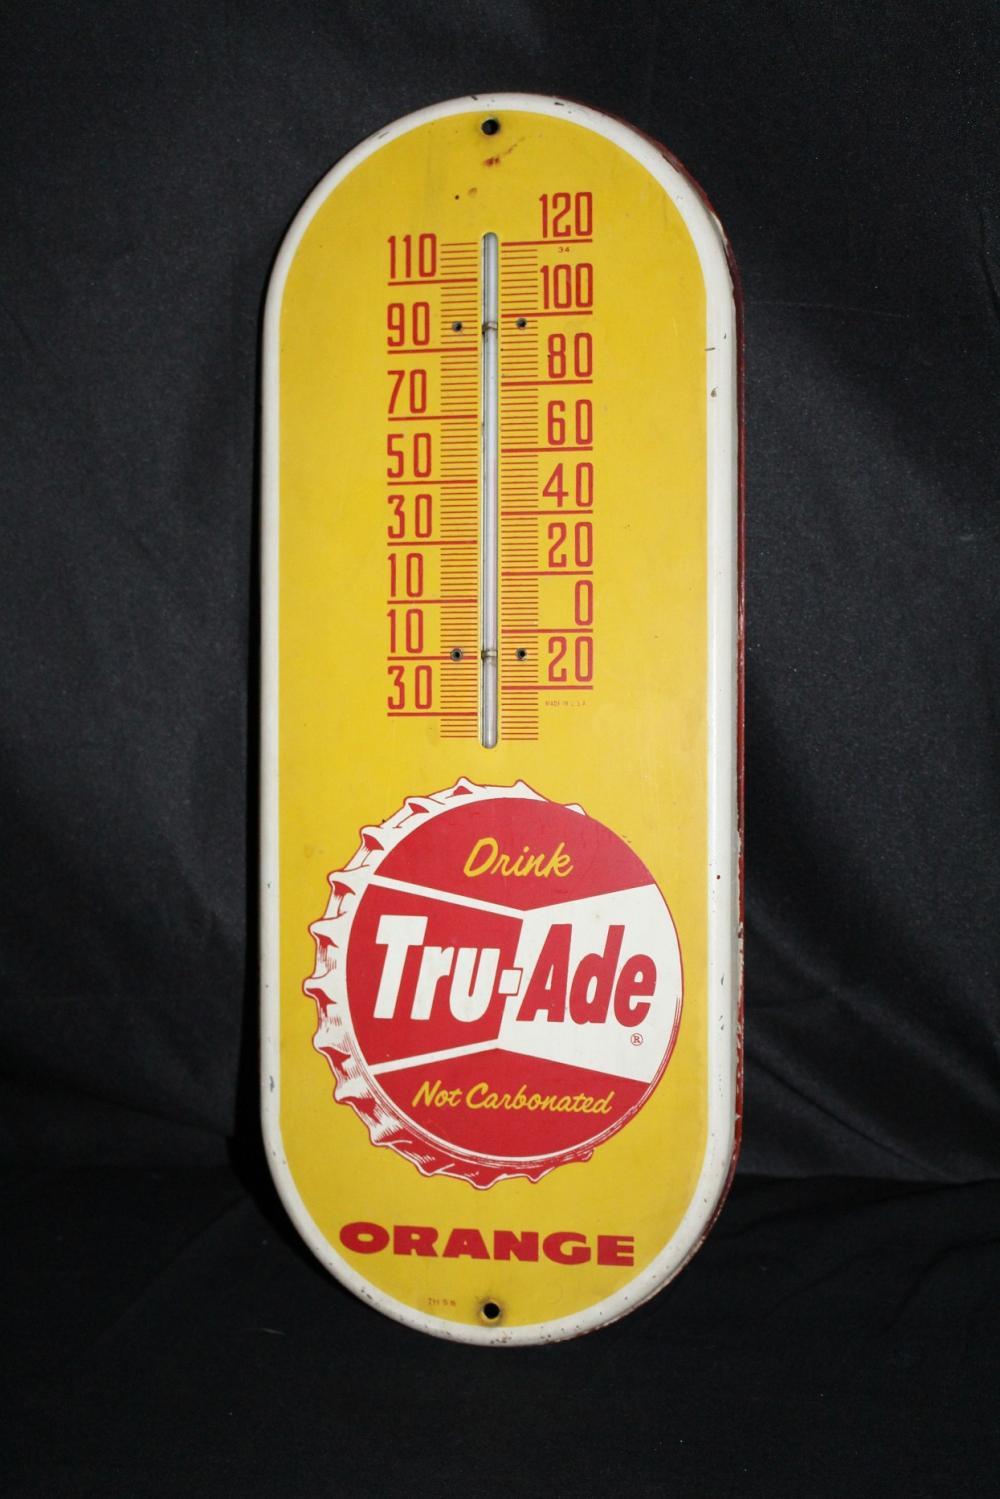 TRU ADE ORANGE SODA POP THERMOMETER TIN SIGN